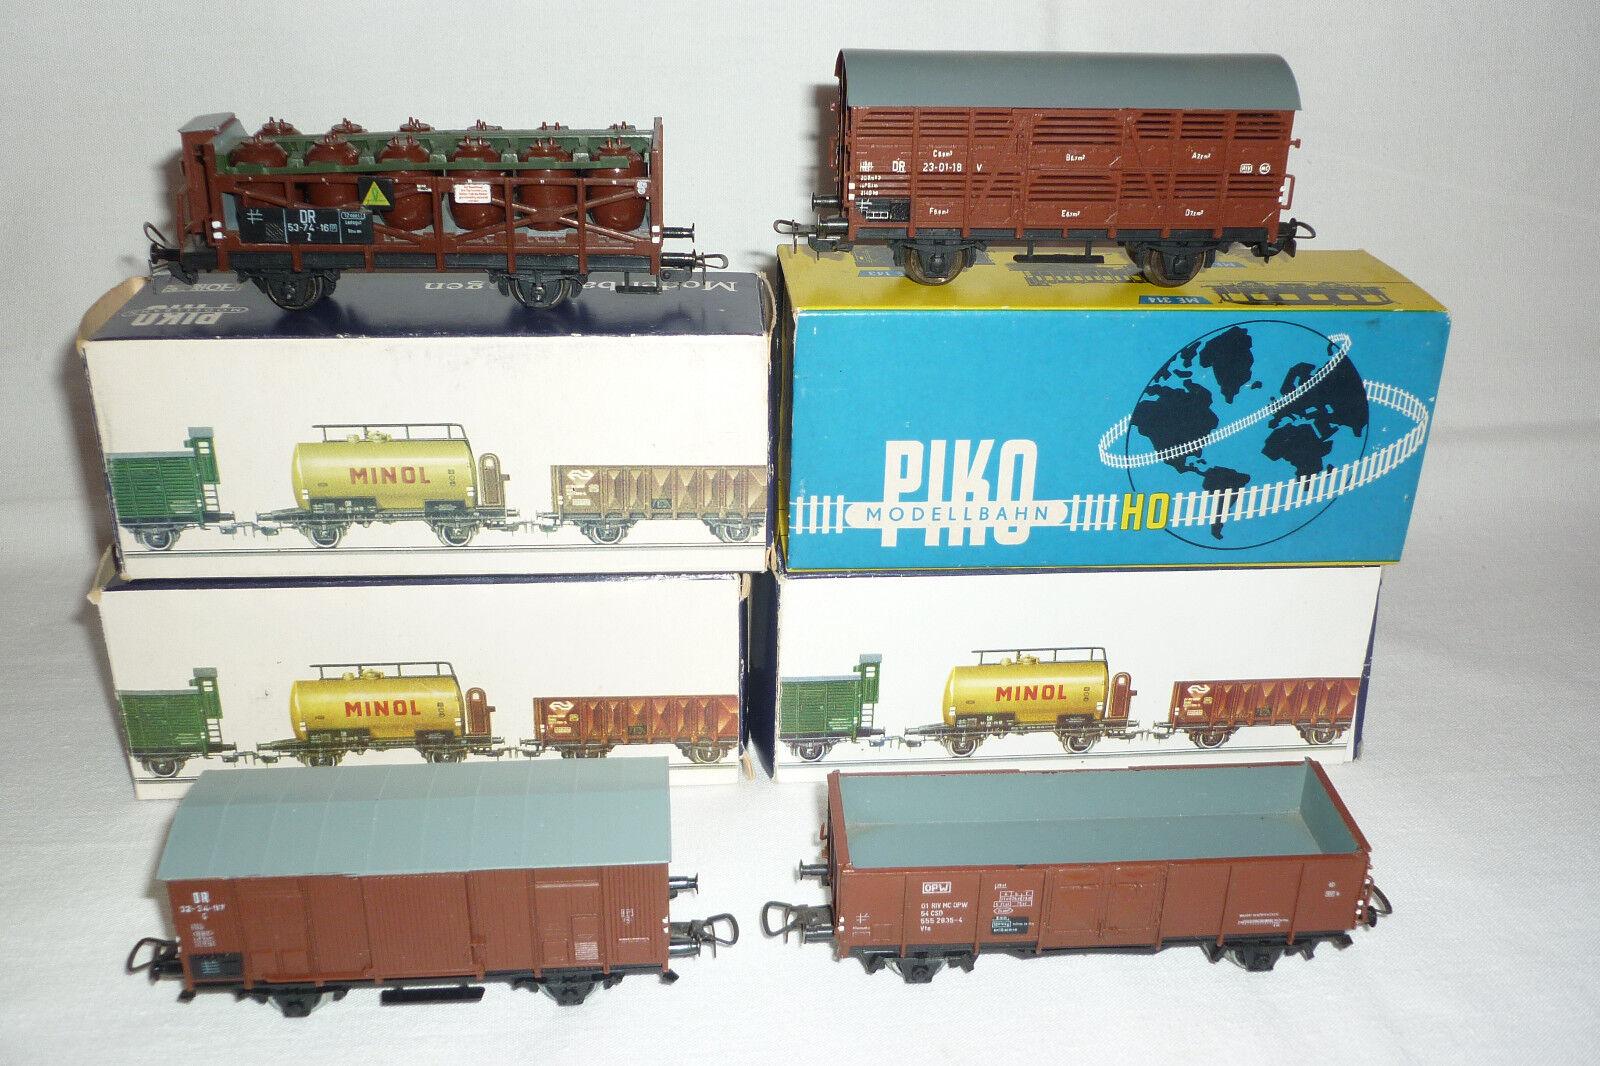 Piko-h0-3 scale car merchandise Cart-your photo (4.ei-36)